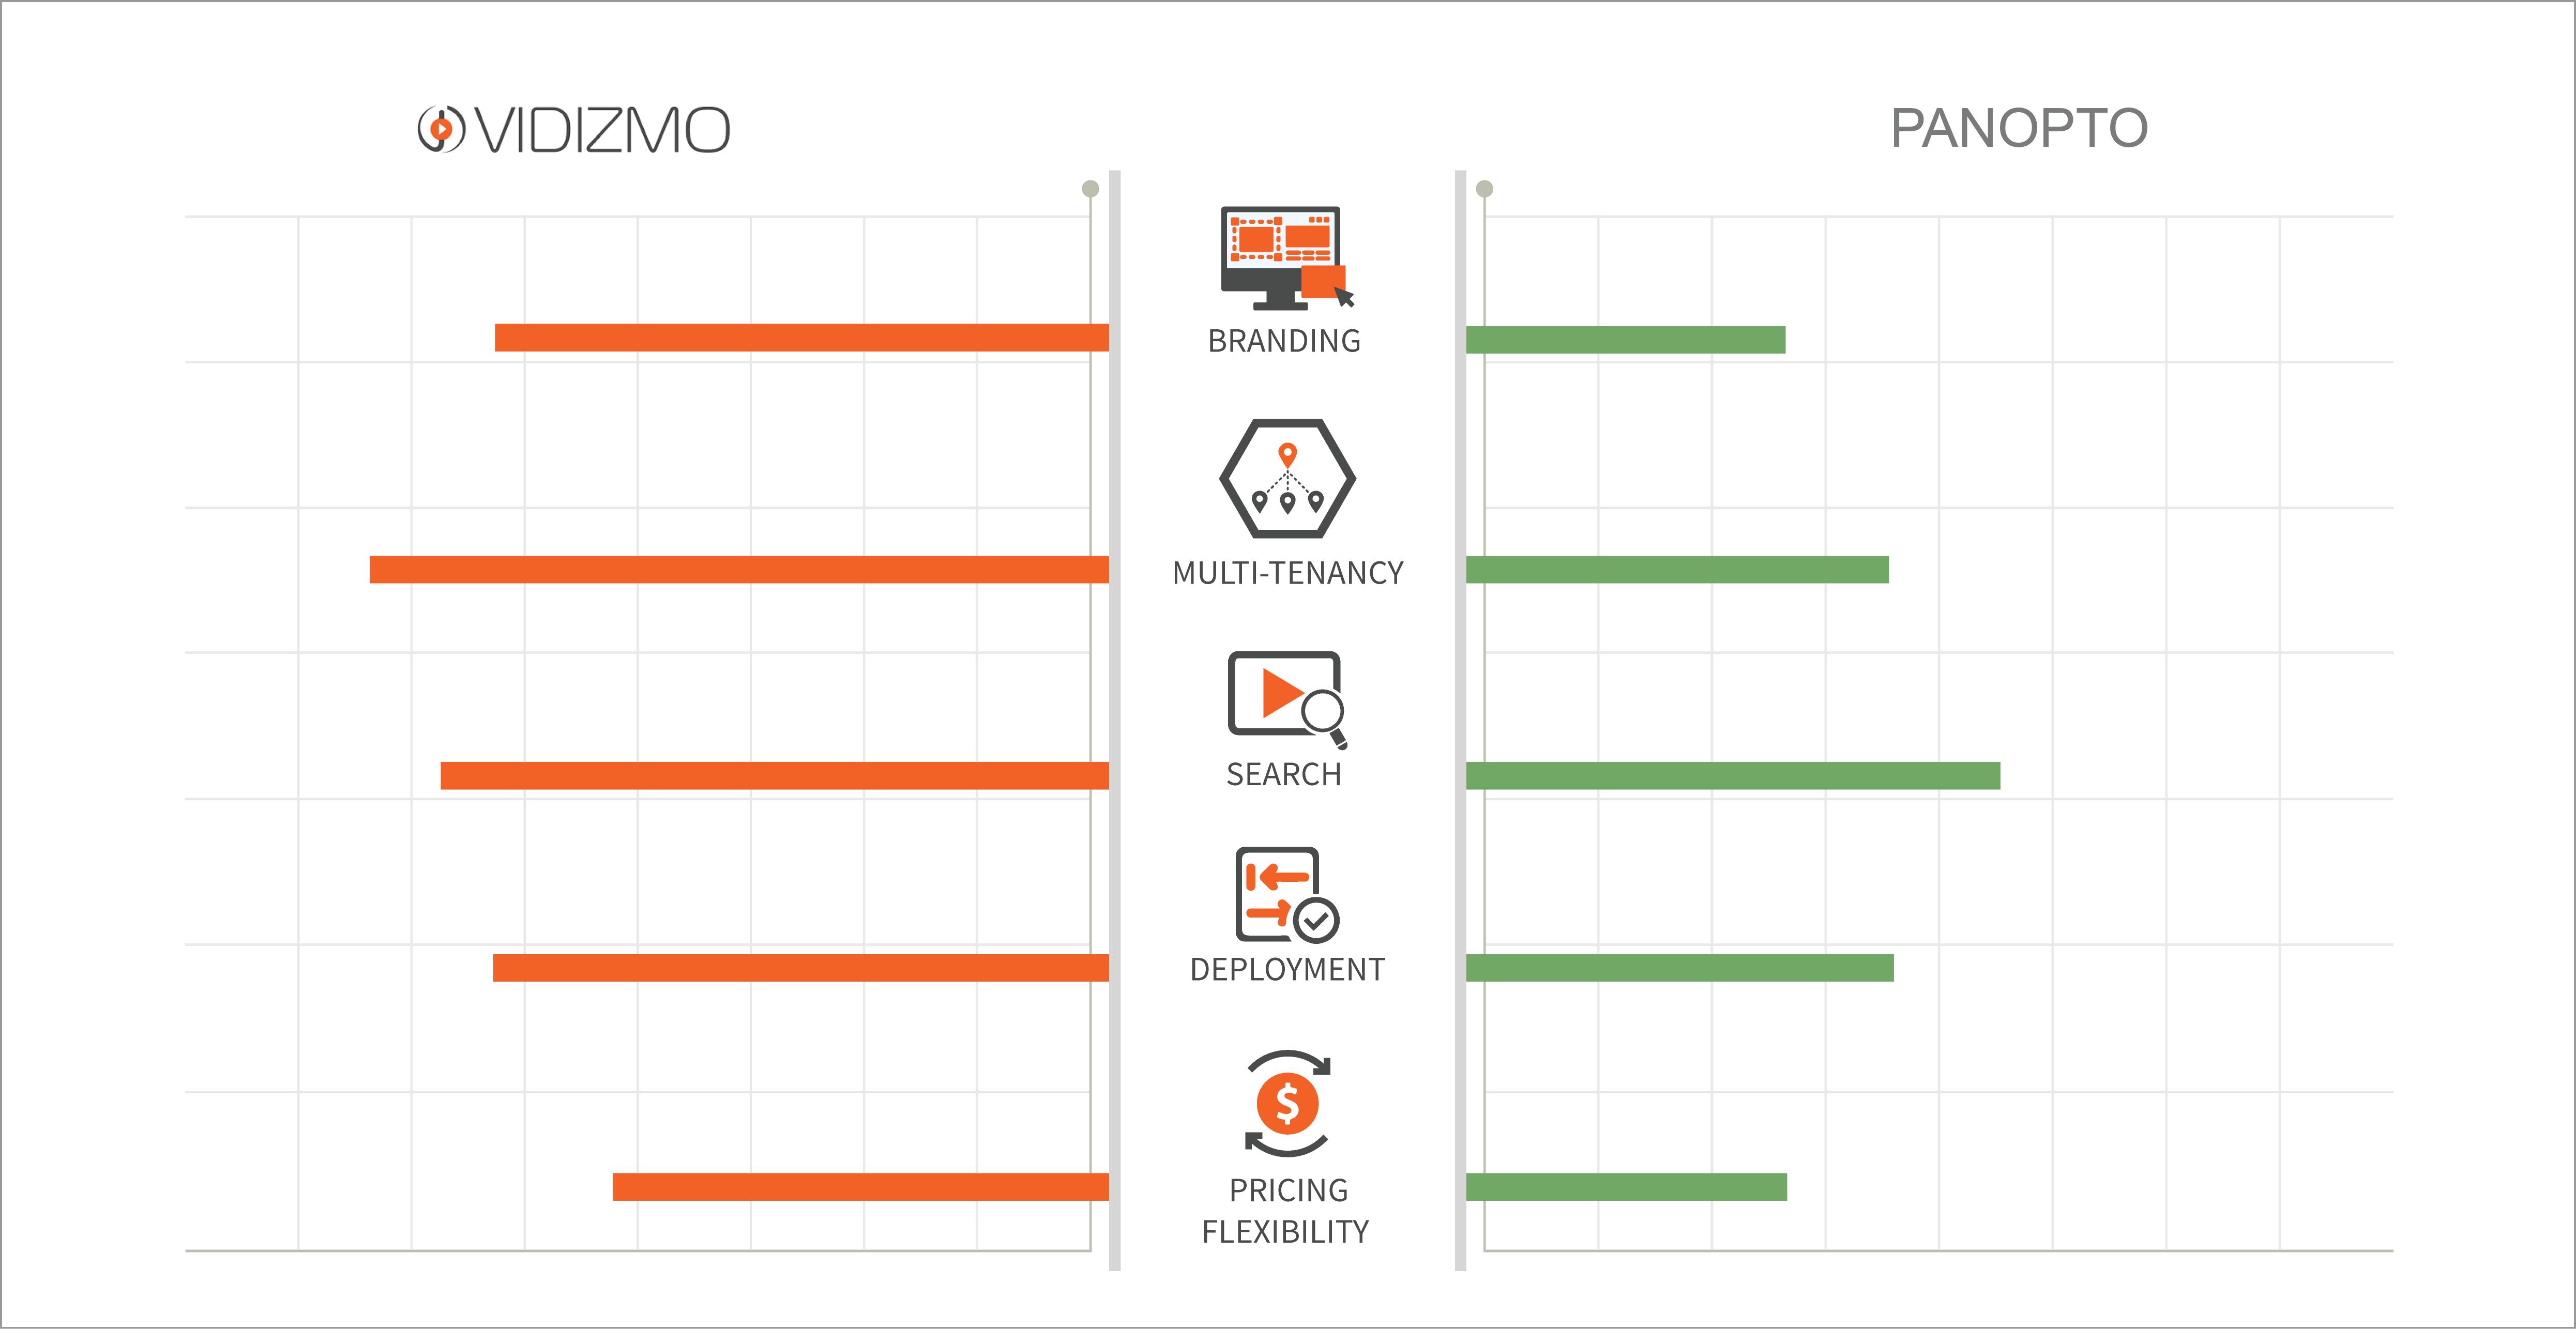 VIDIZMO vs Panopto Comparing critical video platform capabilities